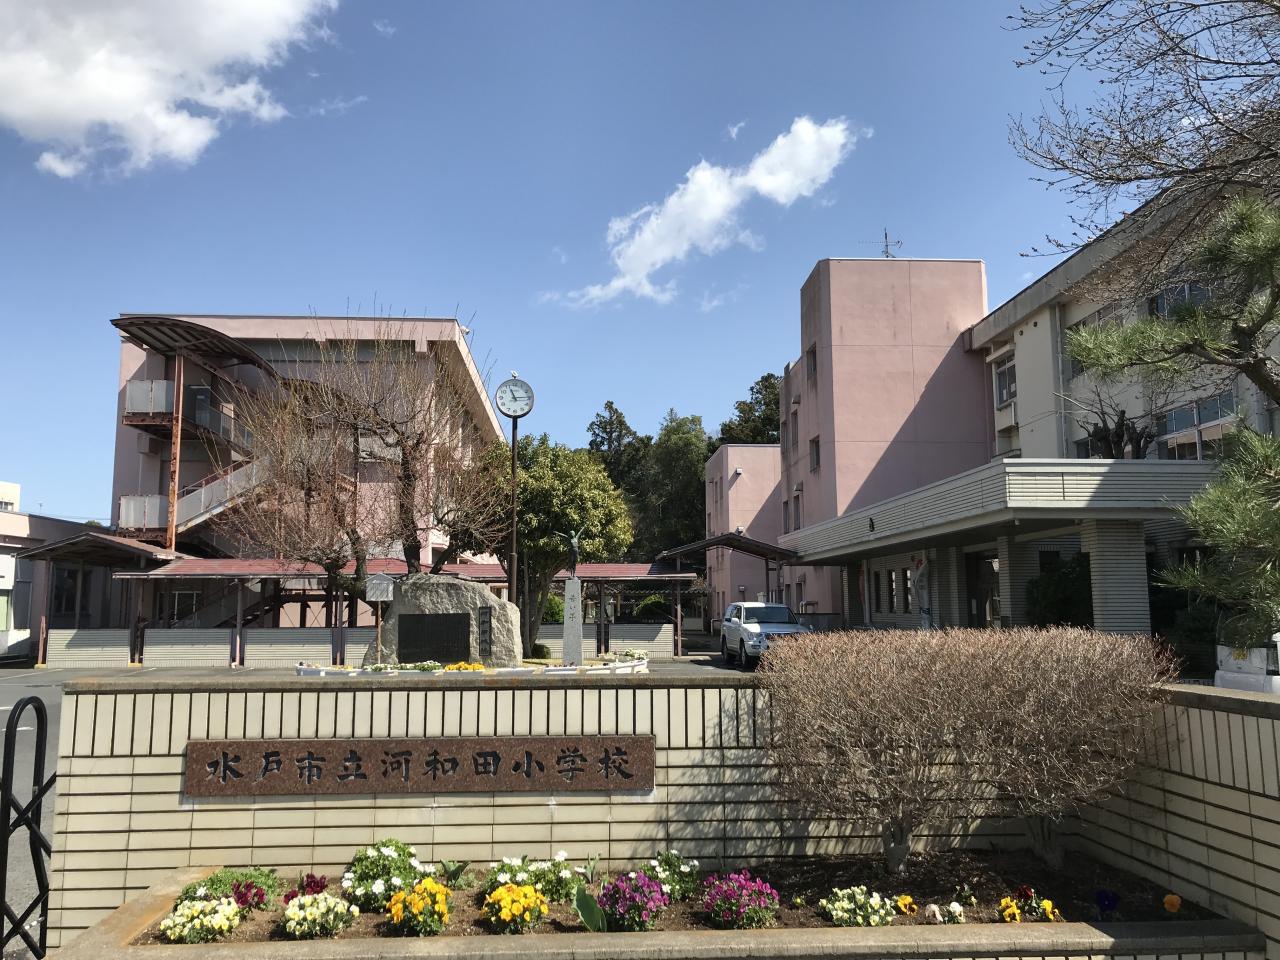 土地 水戸市河和田1丁目 JR常磐線(取手〜いわき)赤塚駅 750万円